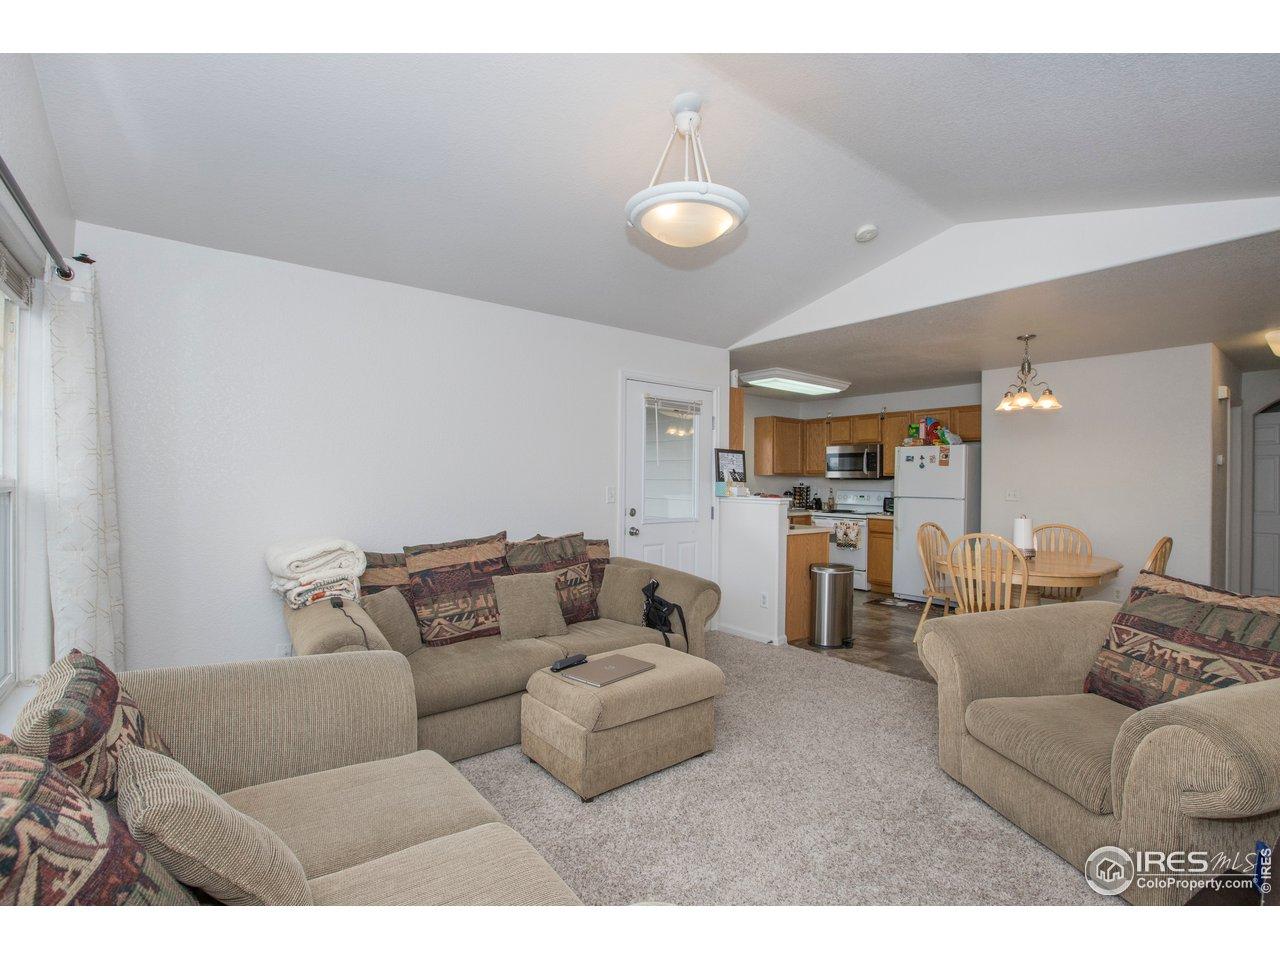 Spacious: living room has many arrangement options